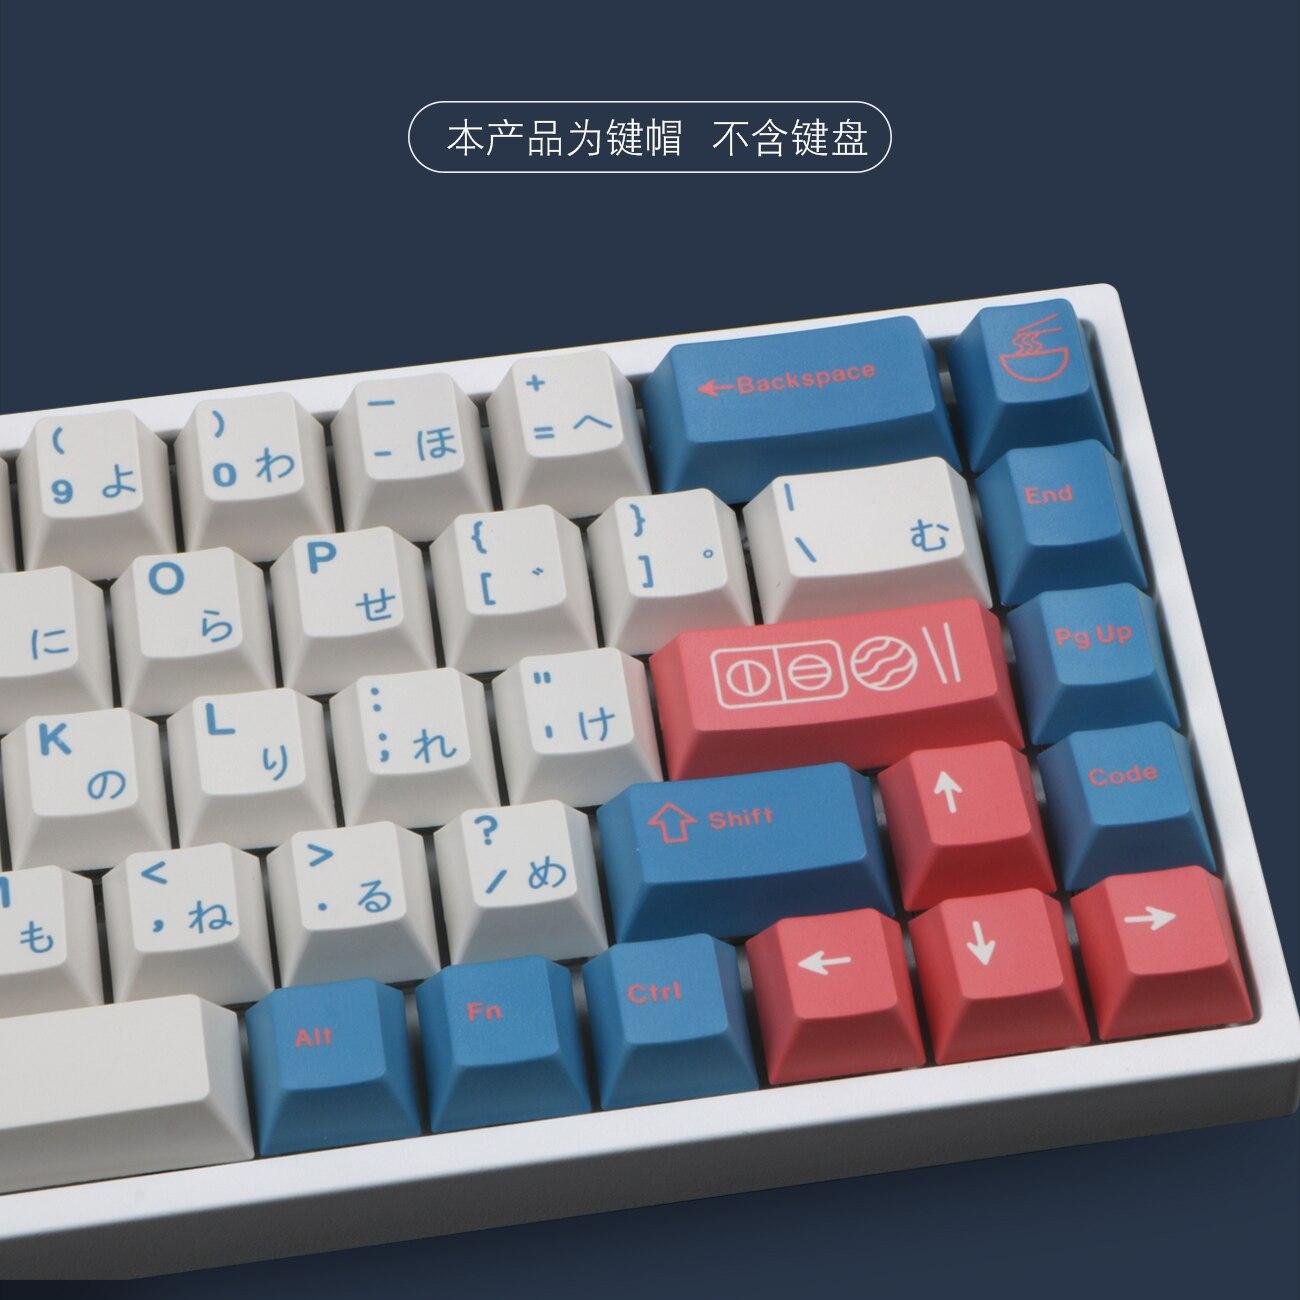 141 keys/set PBT 5 sides Dye subbed Bento Key Caps for MX switch mechanical keyboard Japanese keycaps Cherry profile enlarge